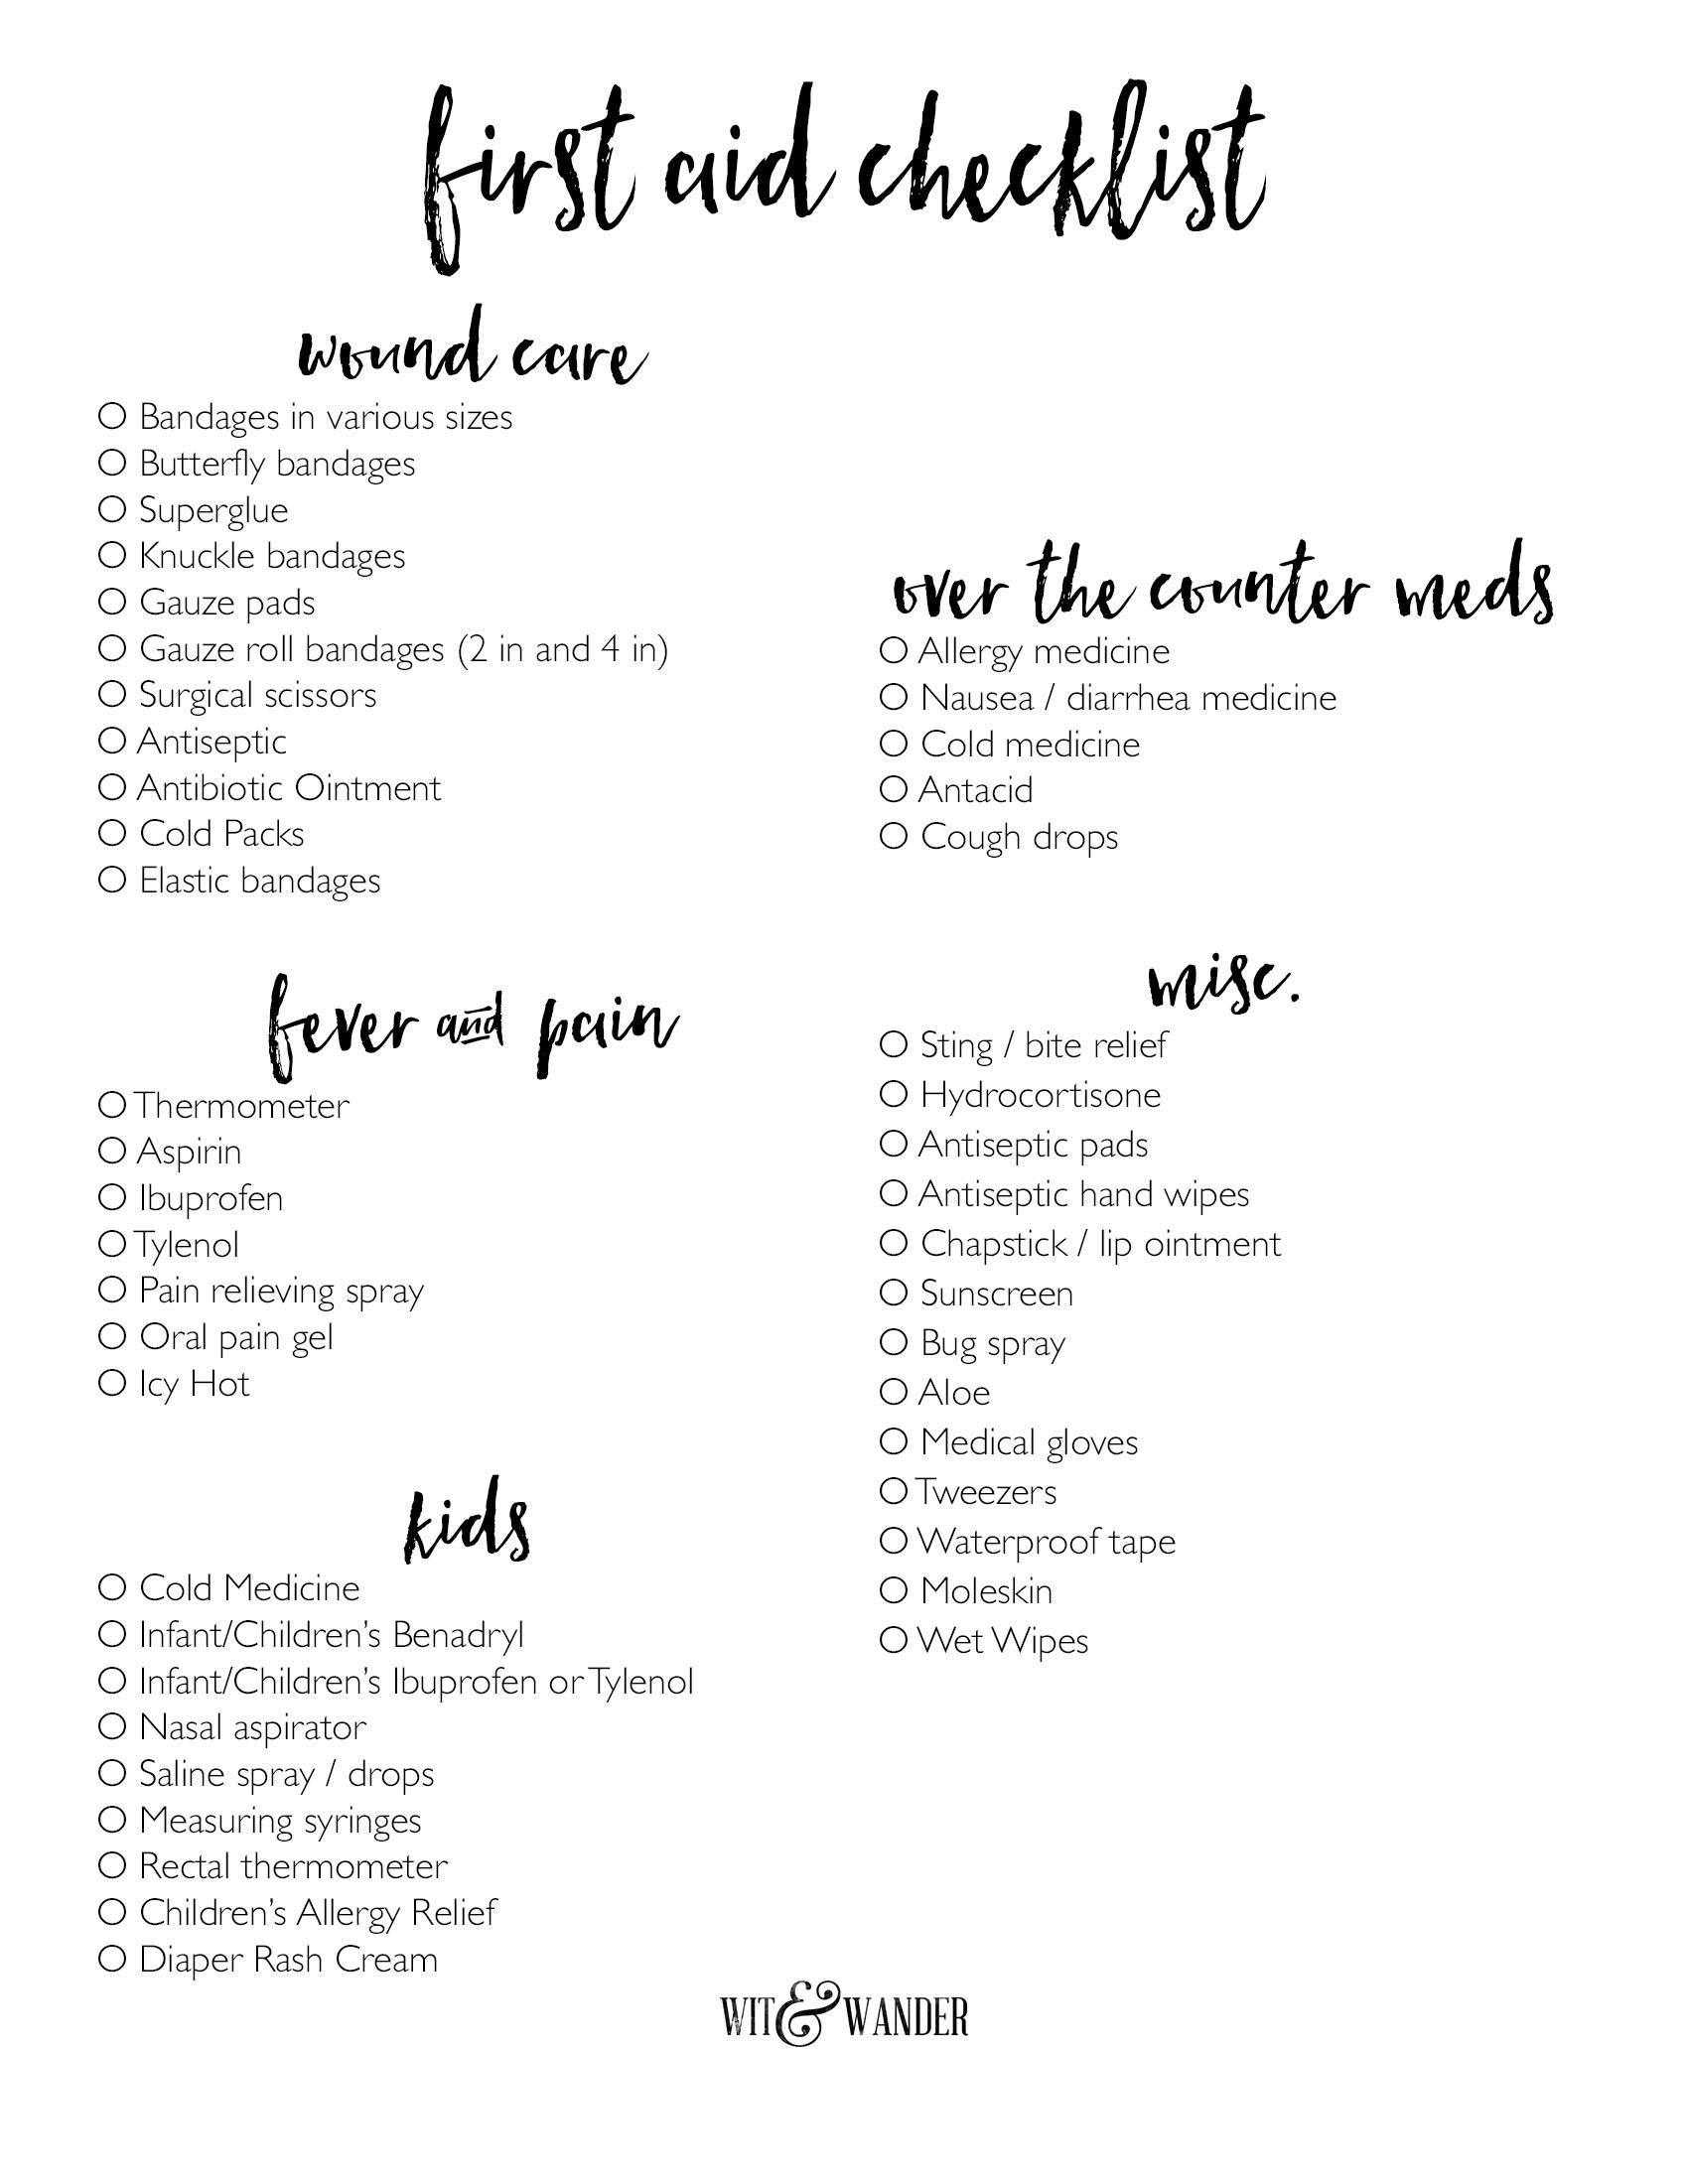 Free Printable First Aid Kit Checklist